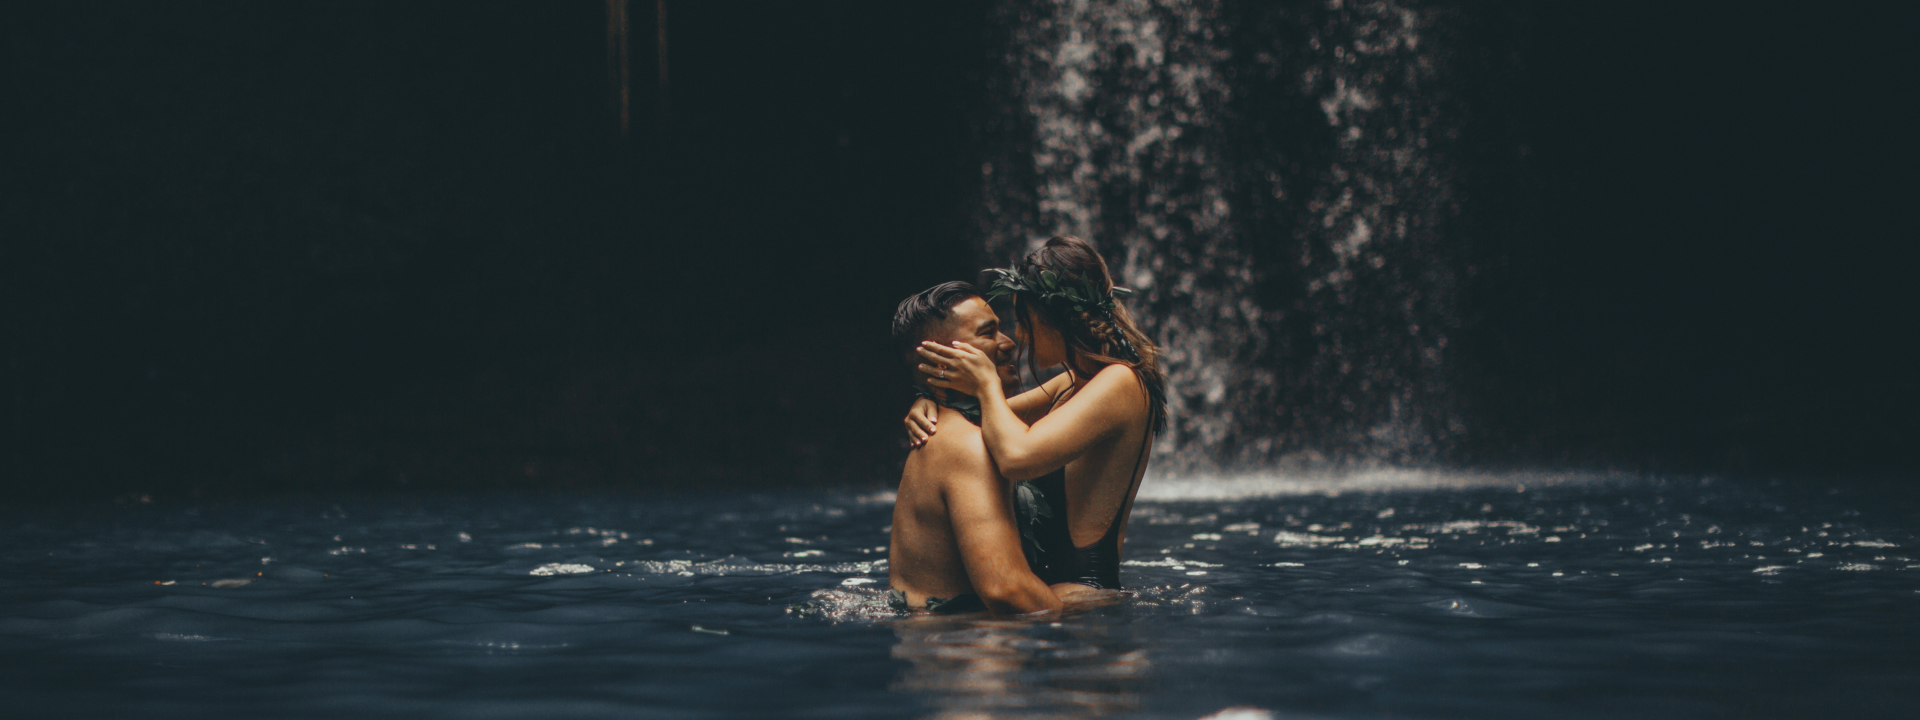 beautiful waterfall engagement photography in maui, hawaii.